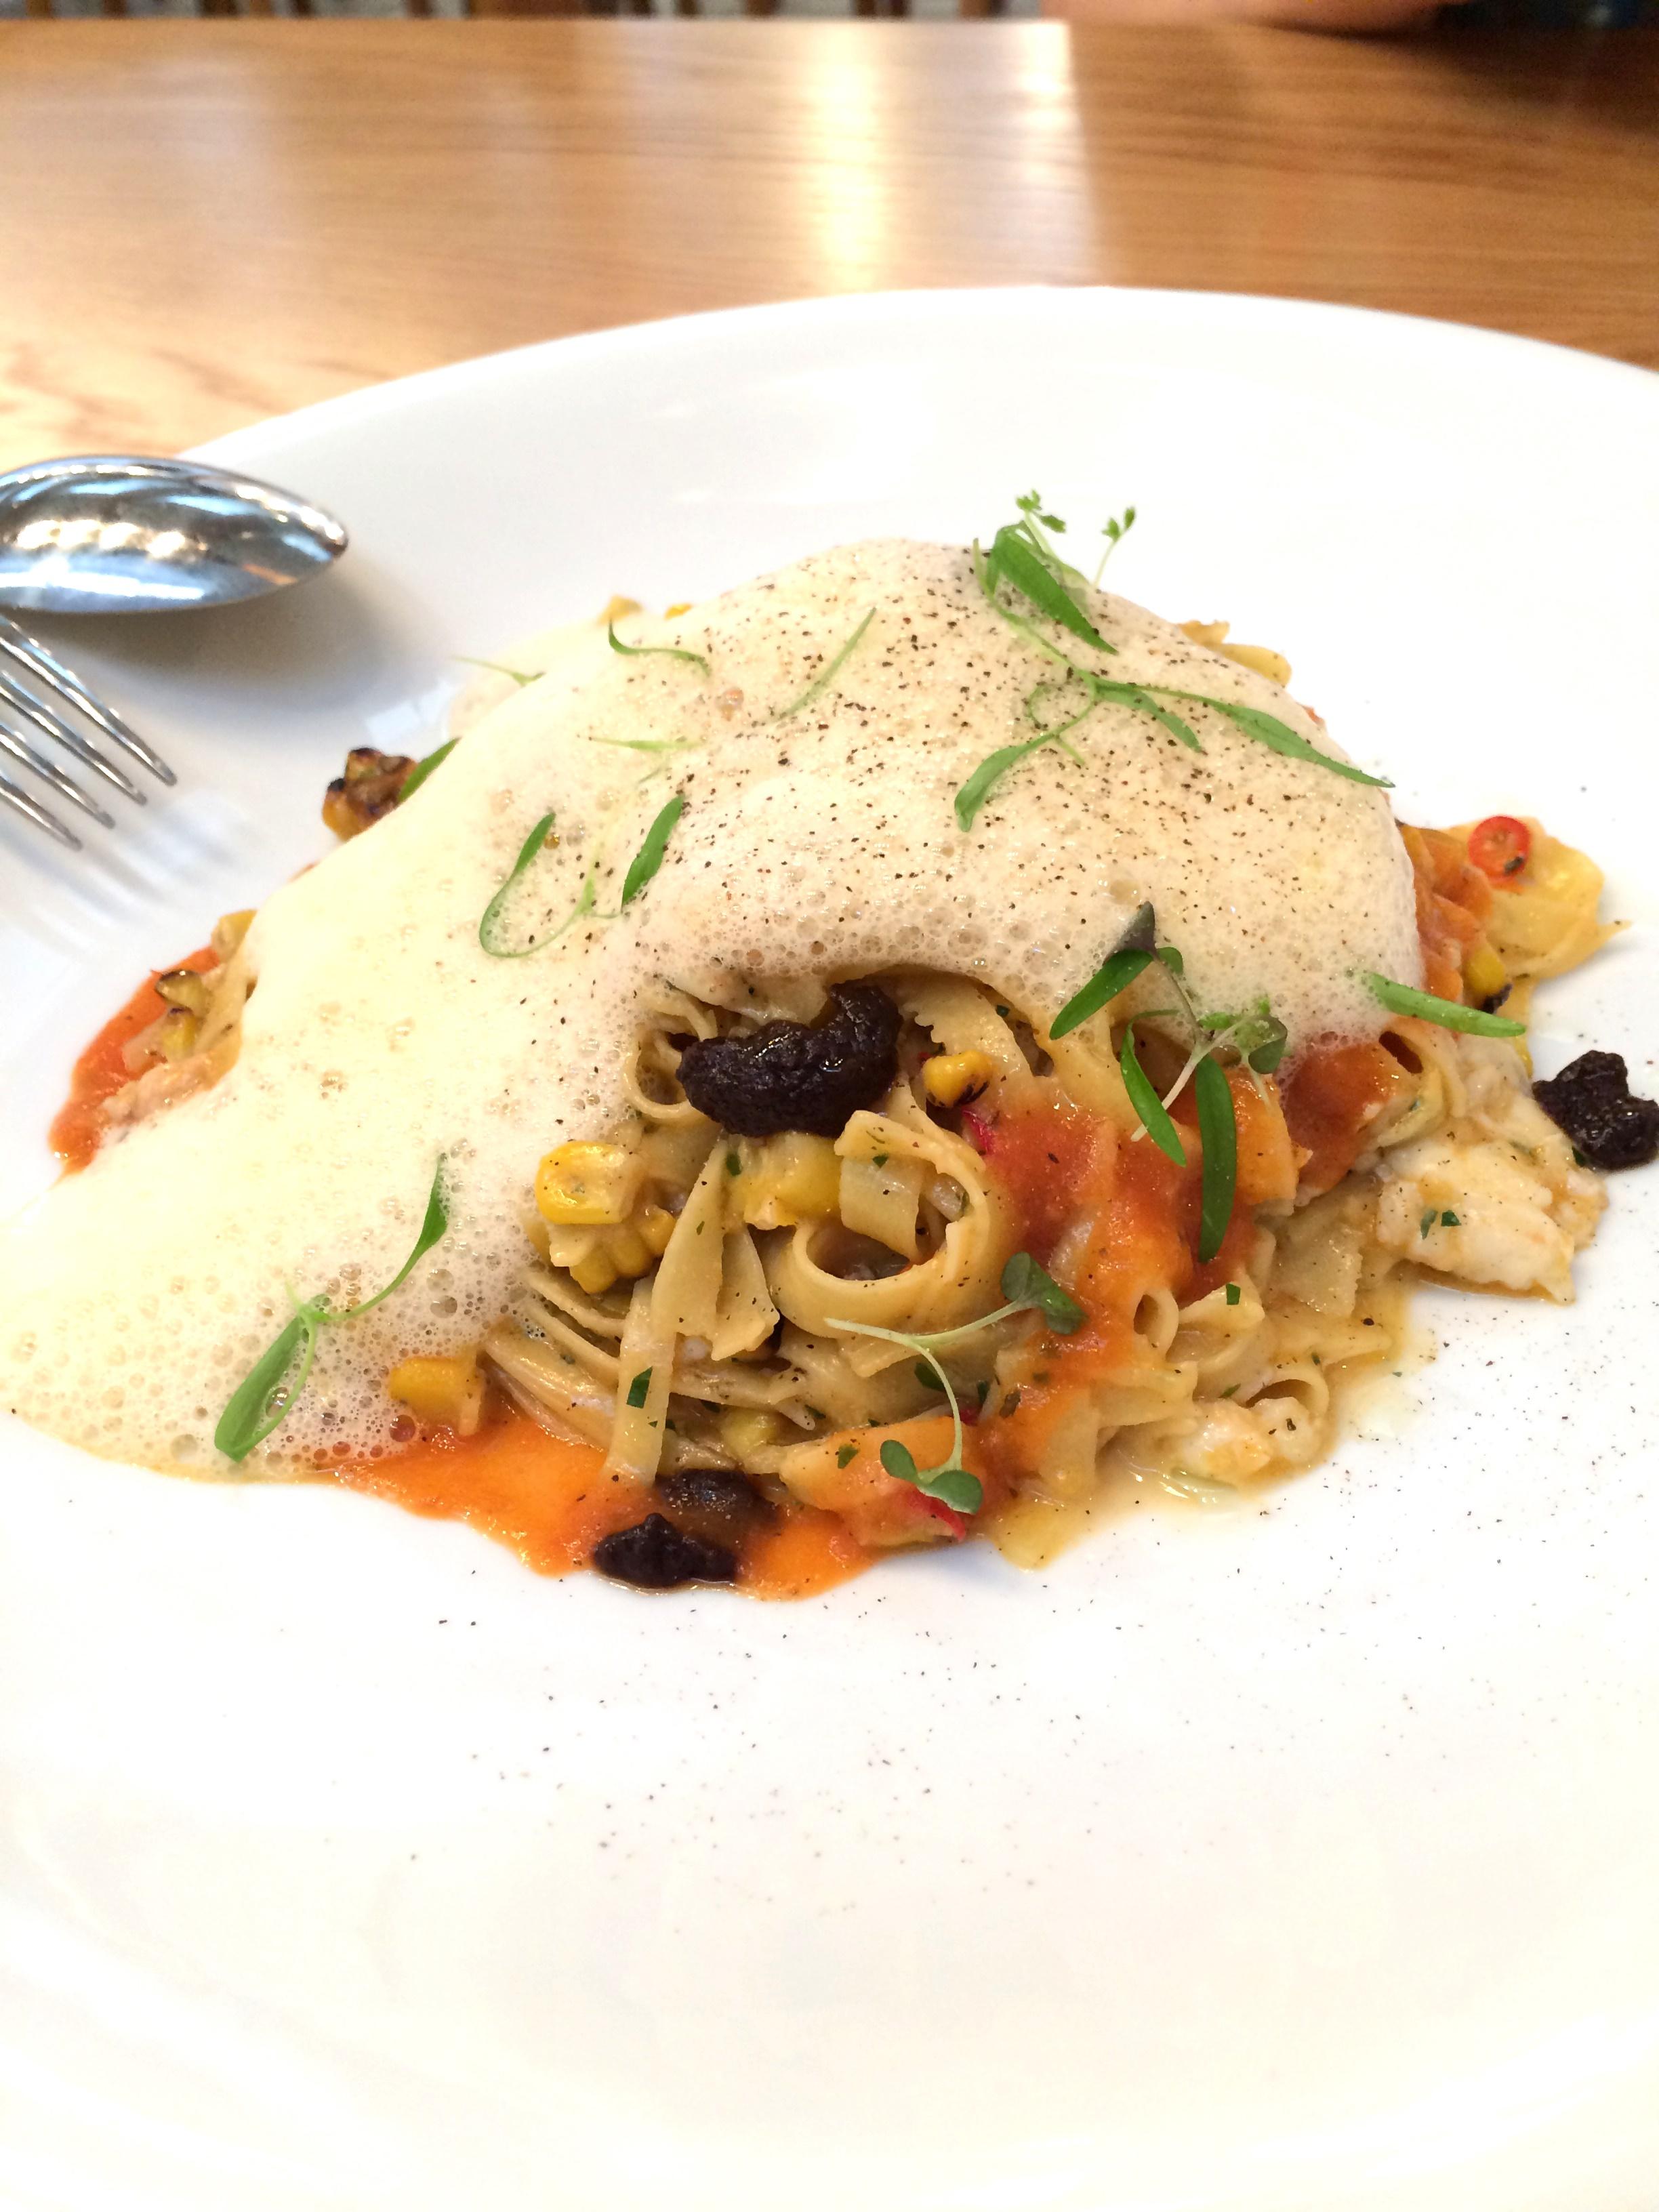 Osteria oggi adelaide jacqui 39 s food fetish for 010 cuisine weekmenu